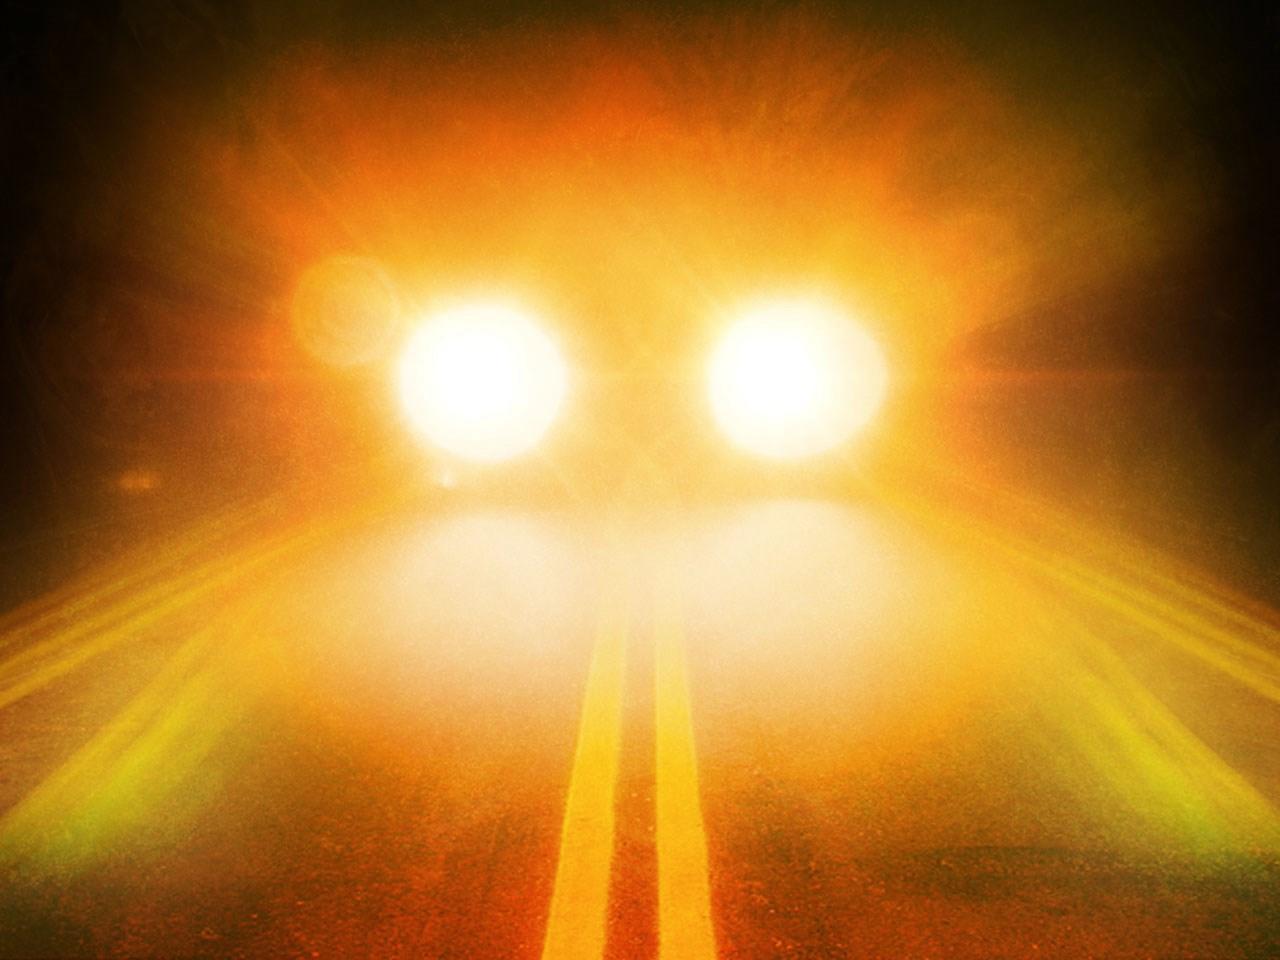 headlights head on crash_1547166566173.jpg.jpg